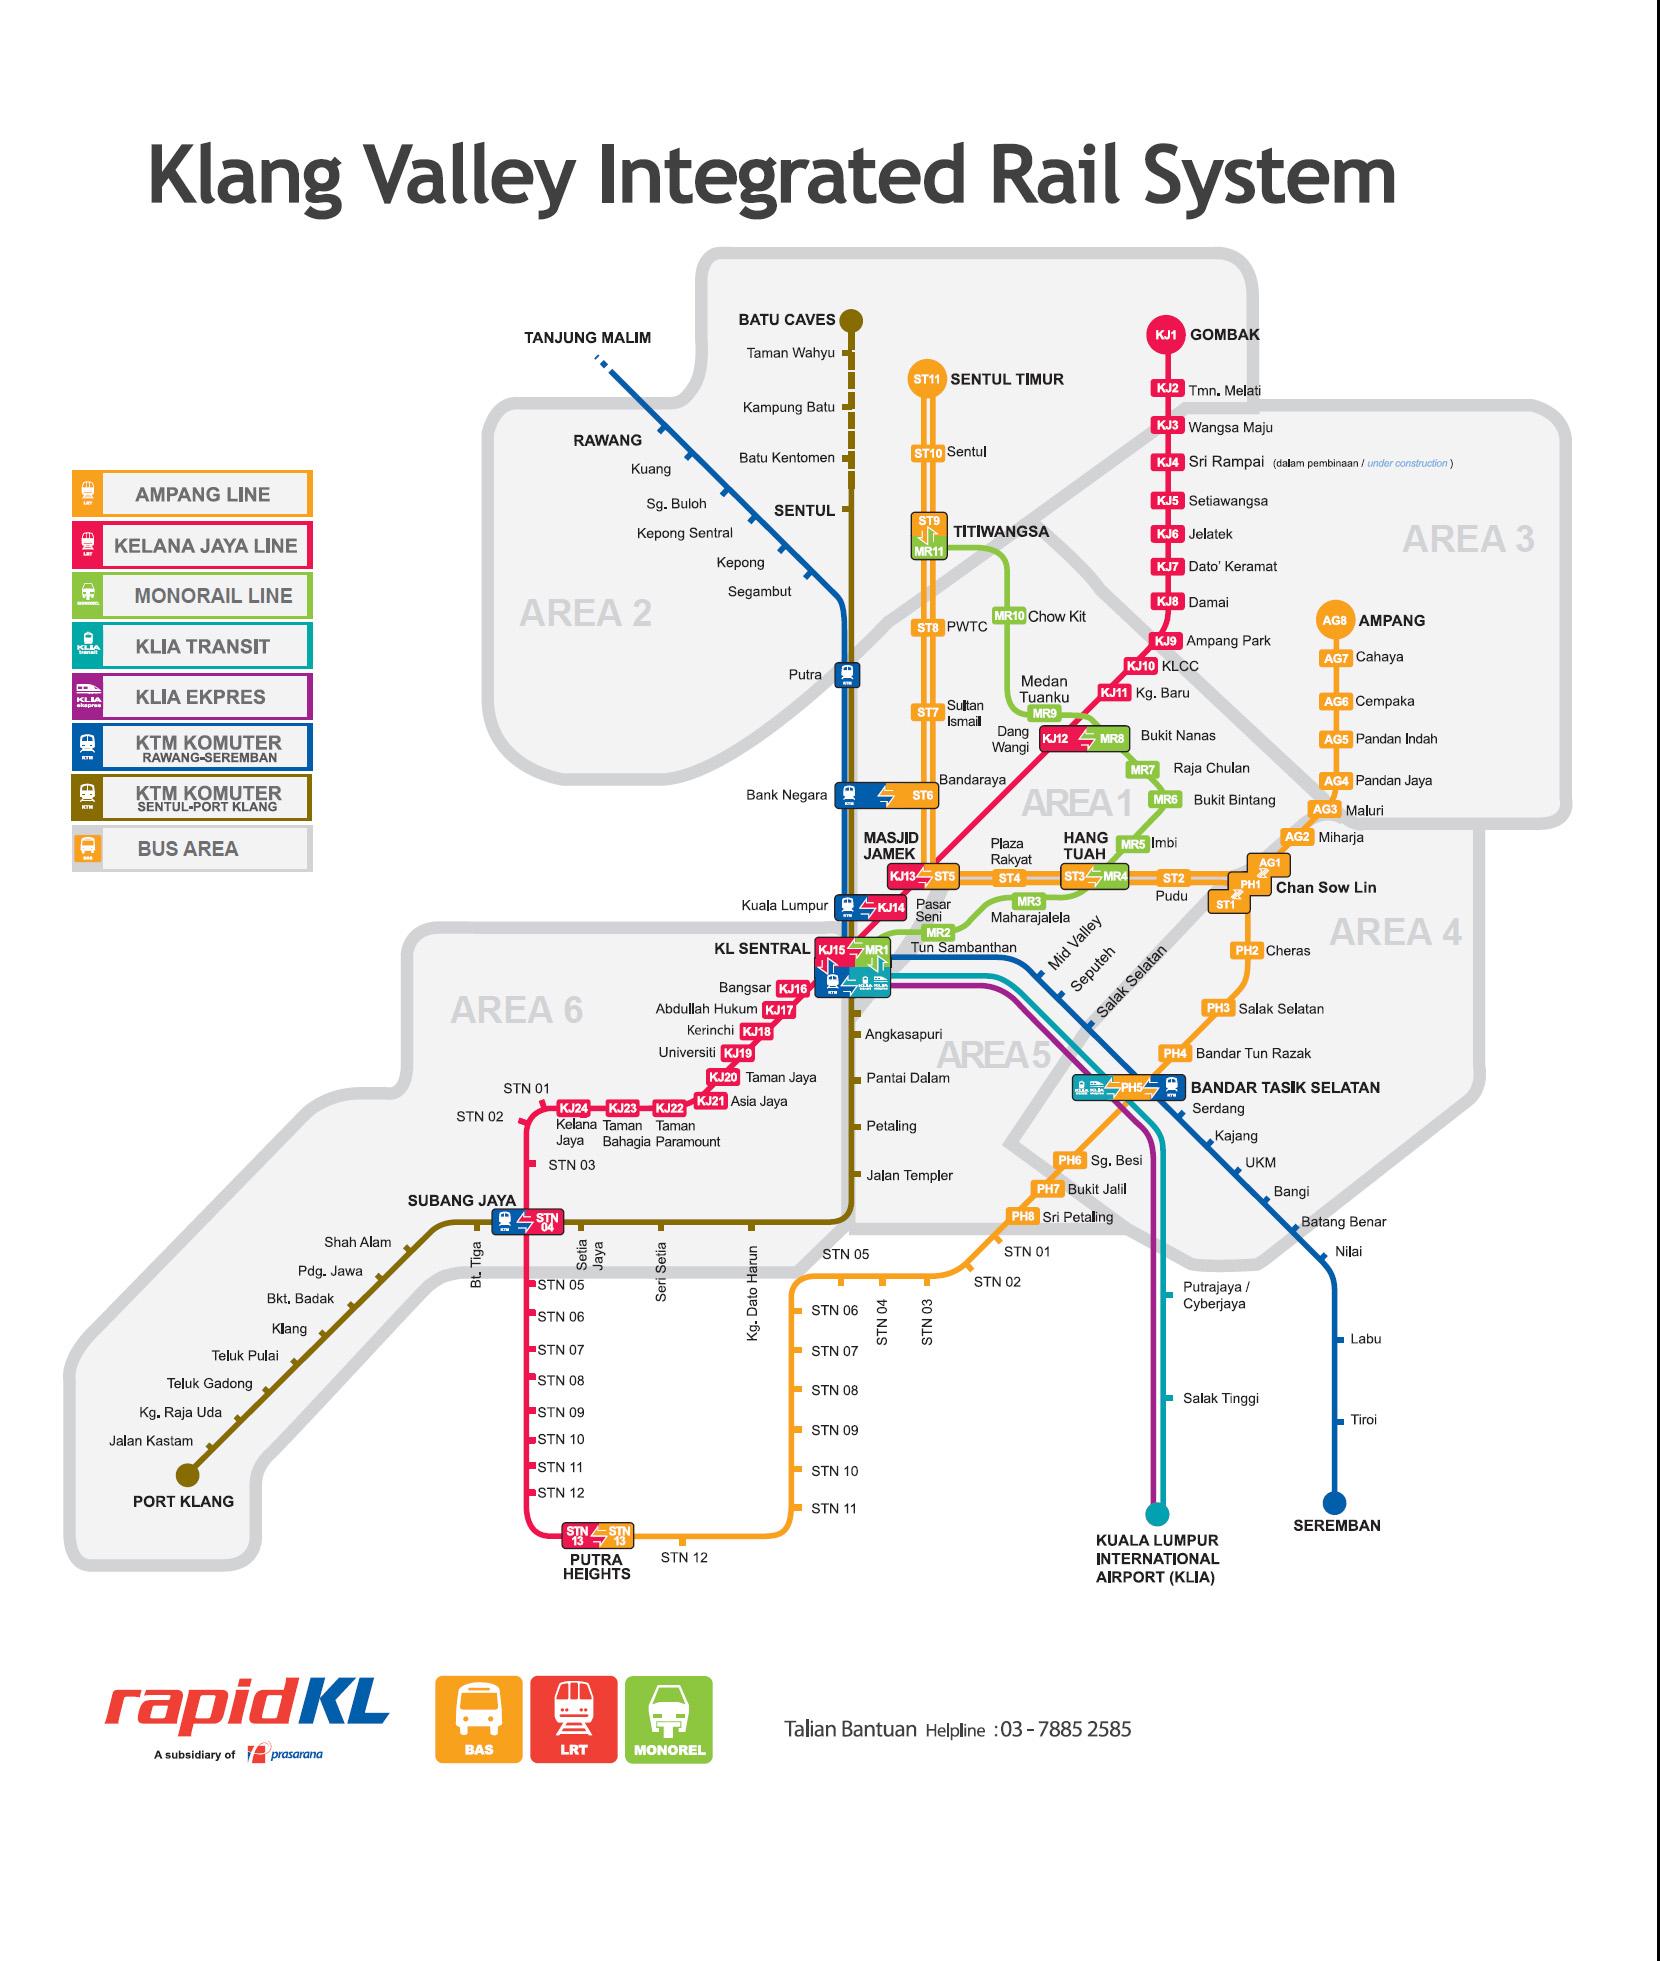 Kuala Lumpur's integrated rail system. The Kelana Jaya line is in magenta.